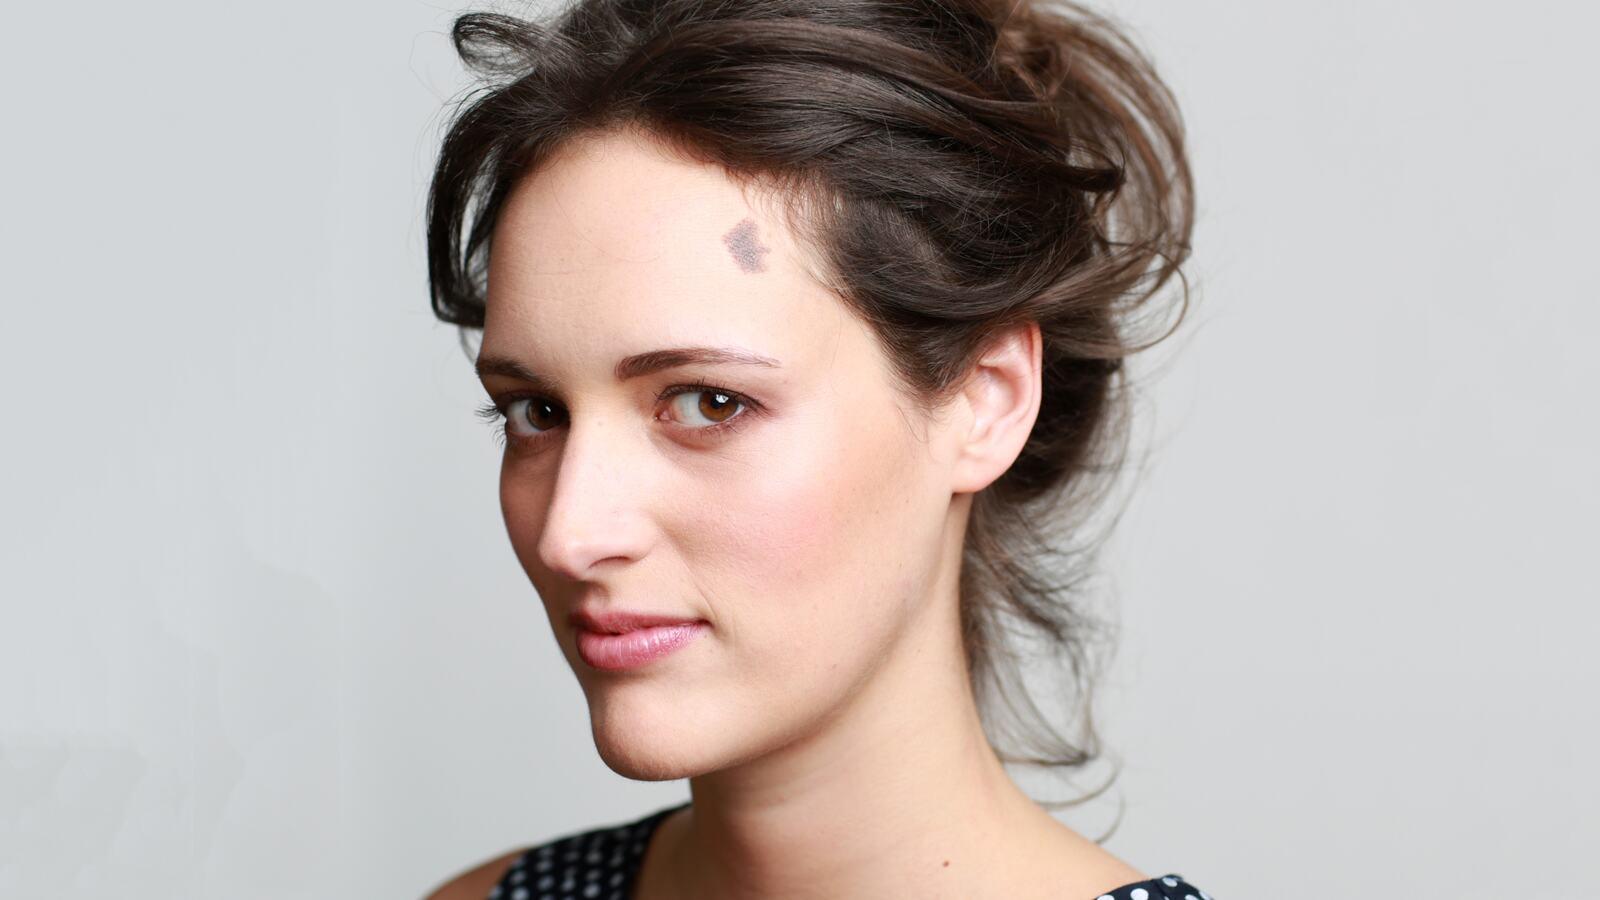 Phoebe Waller-Bridge, star and writer of Fleabag